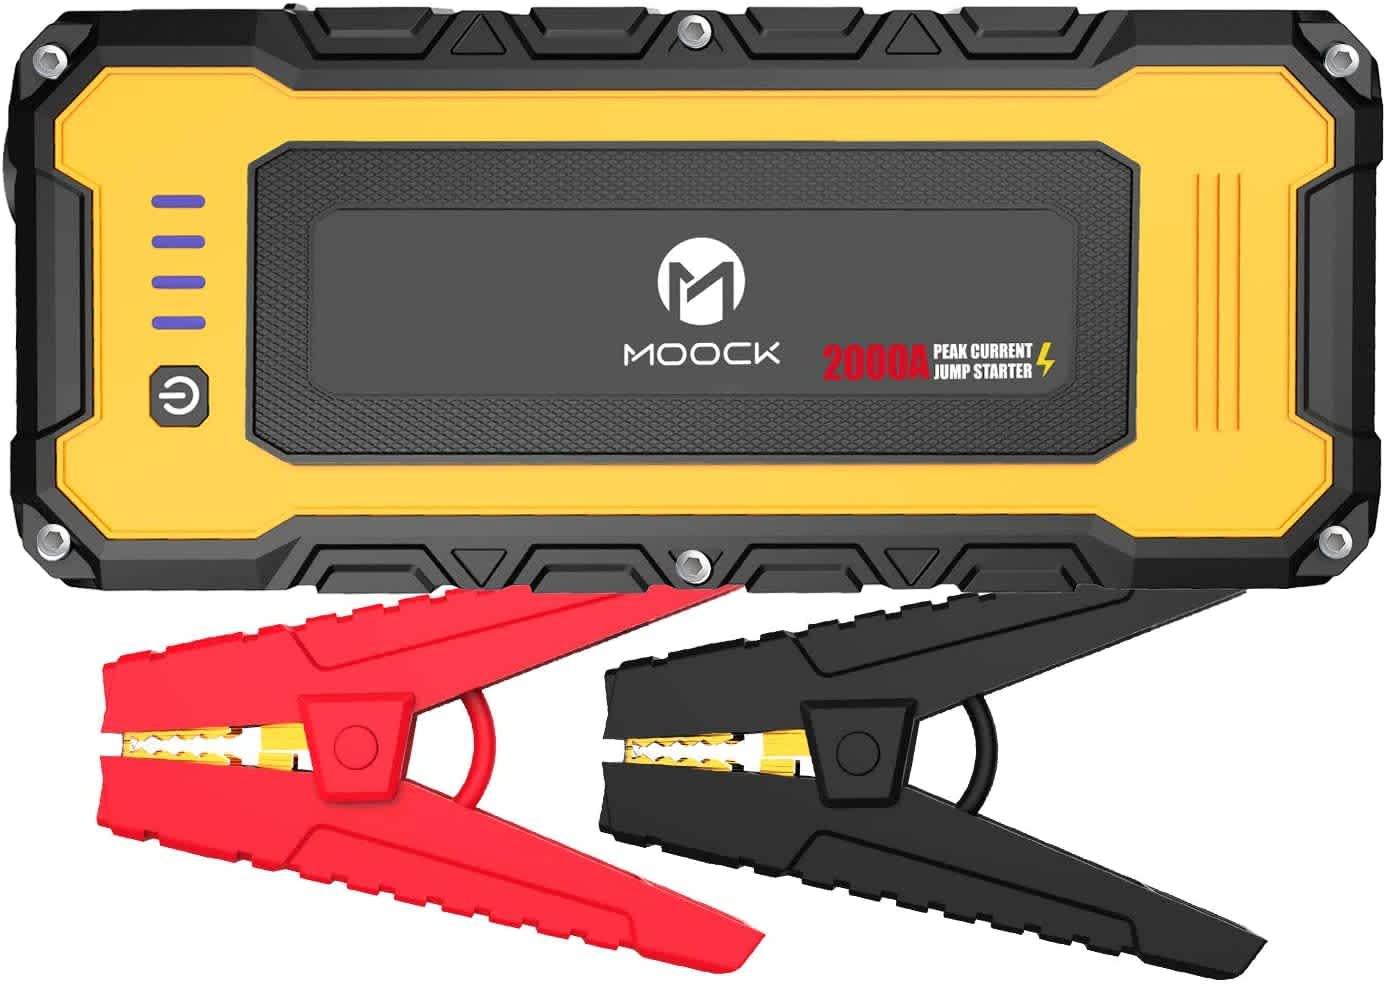 Moock 20,080mAh Power Bank & Jump Starter